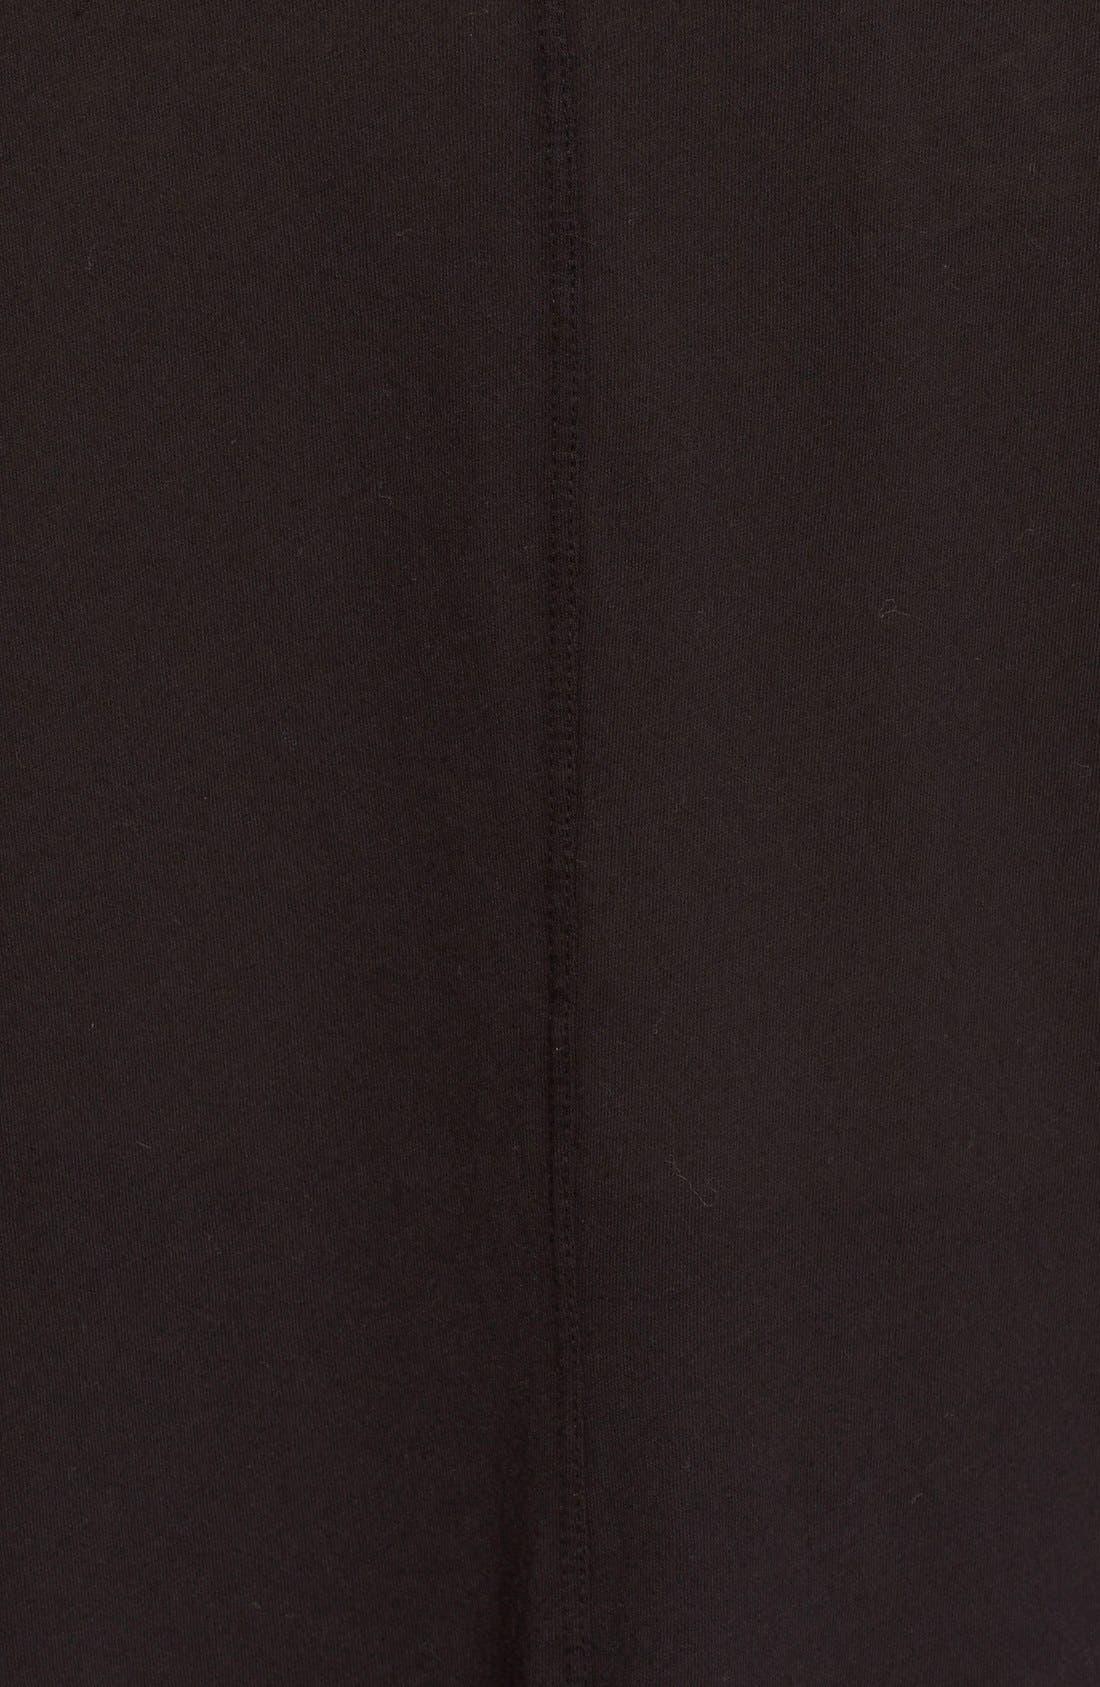 Oversize Pima Cotton Tee,                             Alternate thumbnail 4, color,                             001